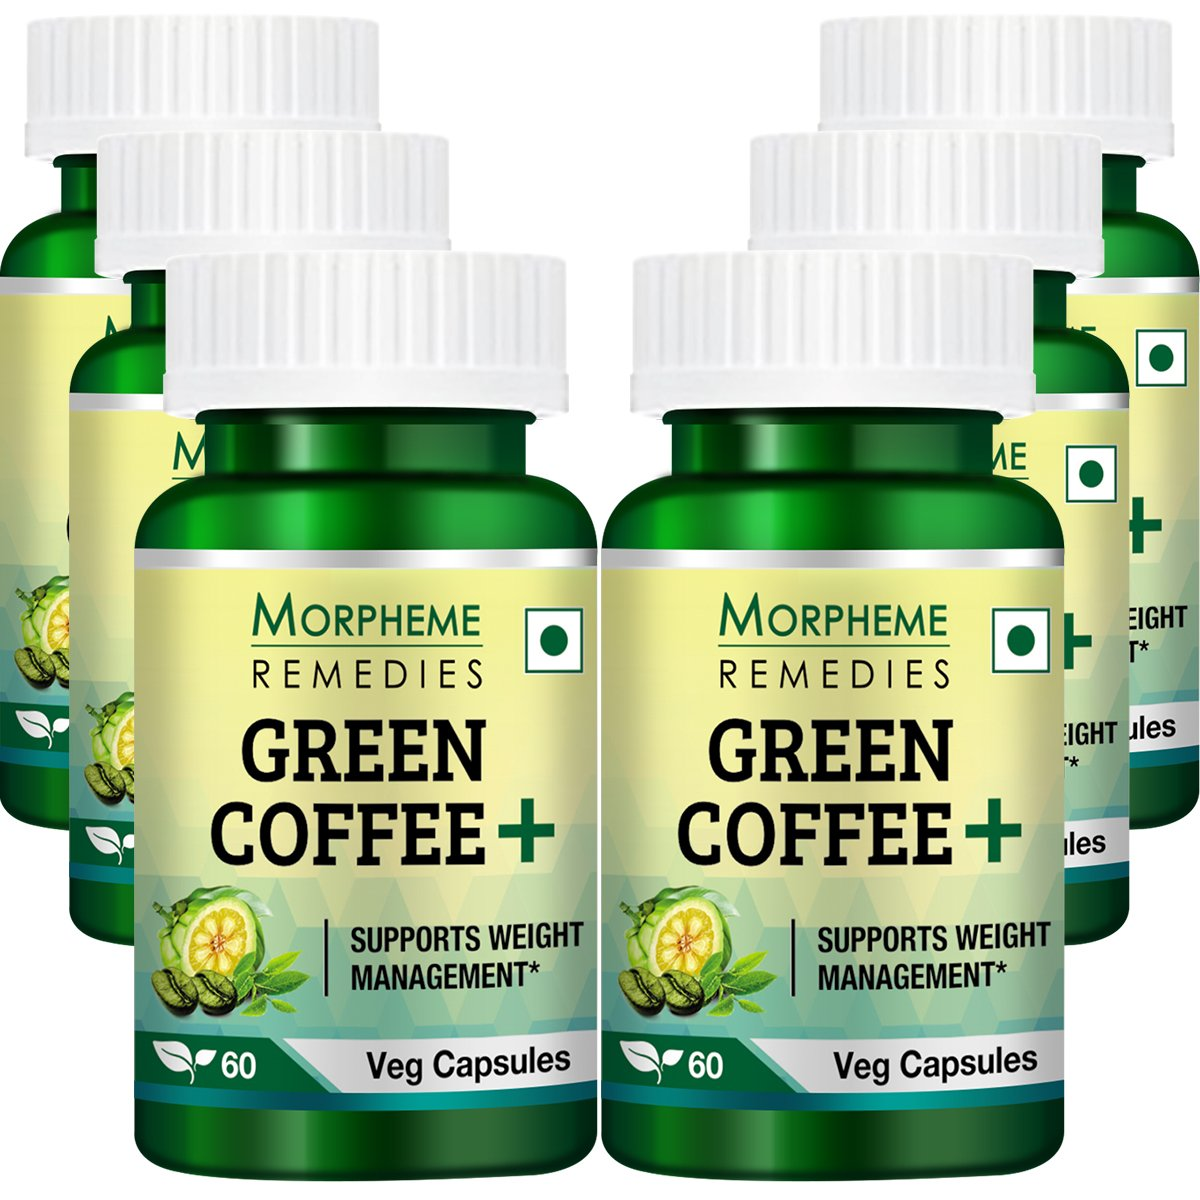 Morpheme Green Coffee+ (Garcinia + Green Coffee + Green Tea) 60 Veg Caps - 6 Bottles